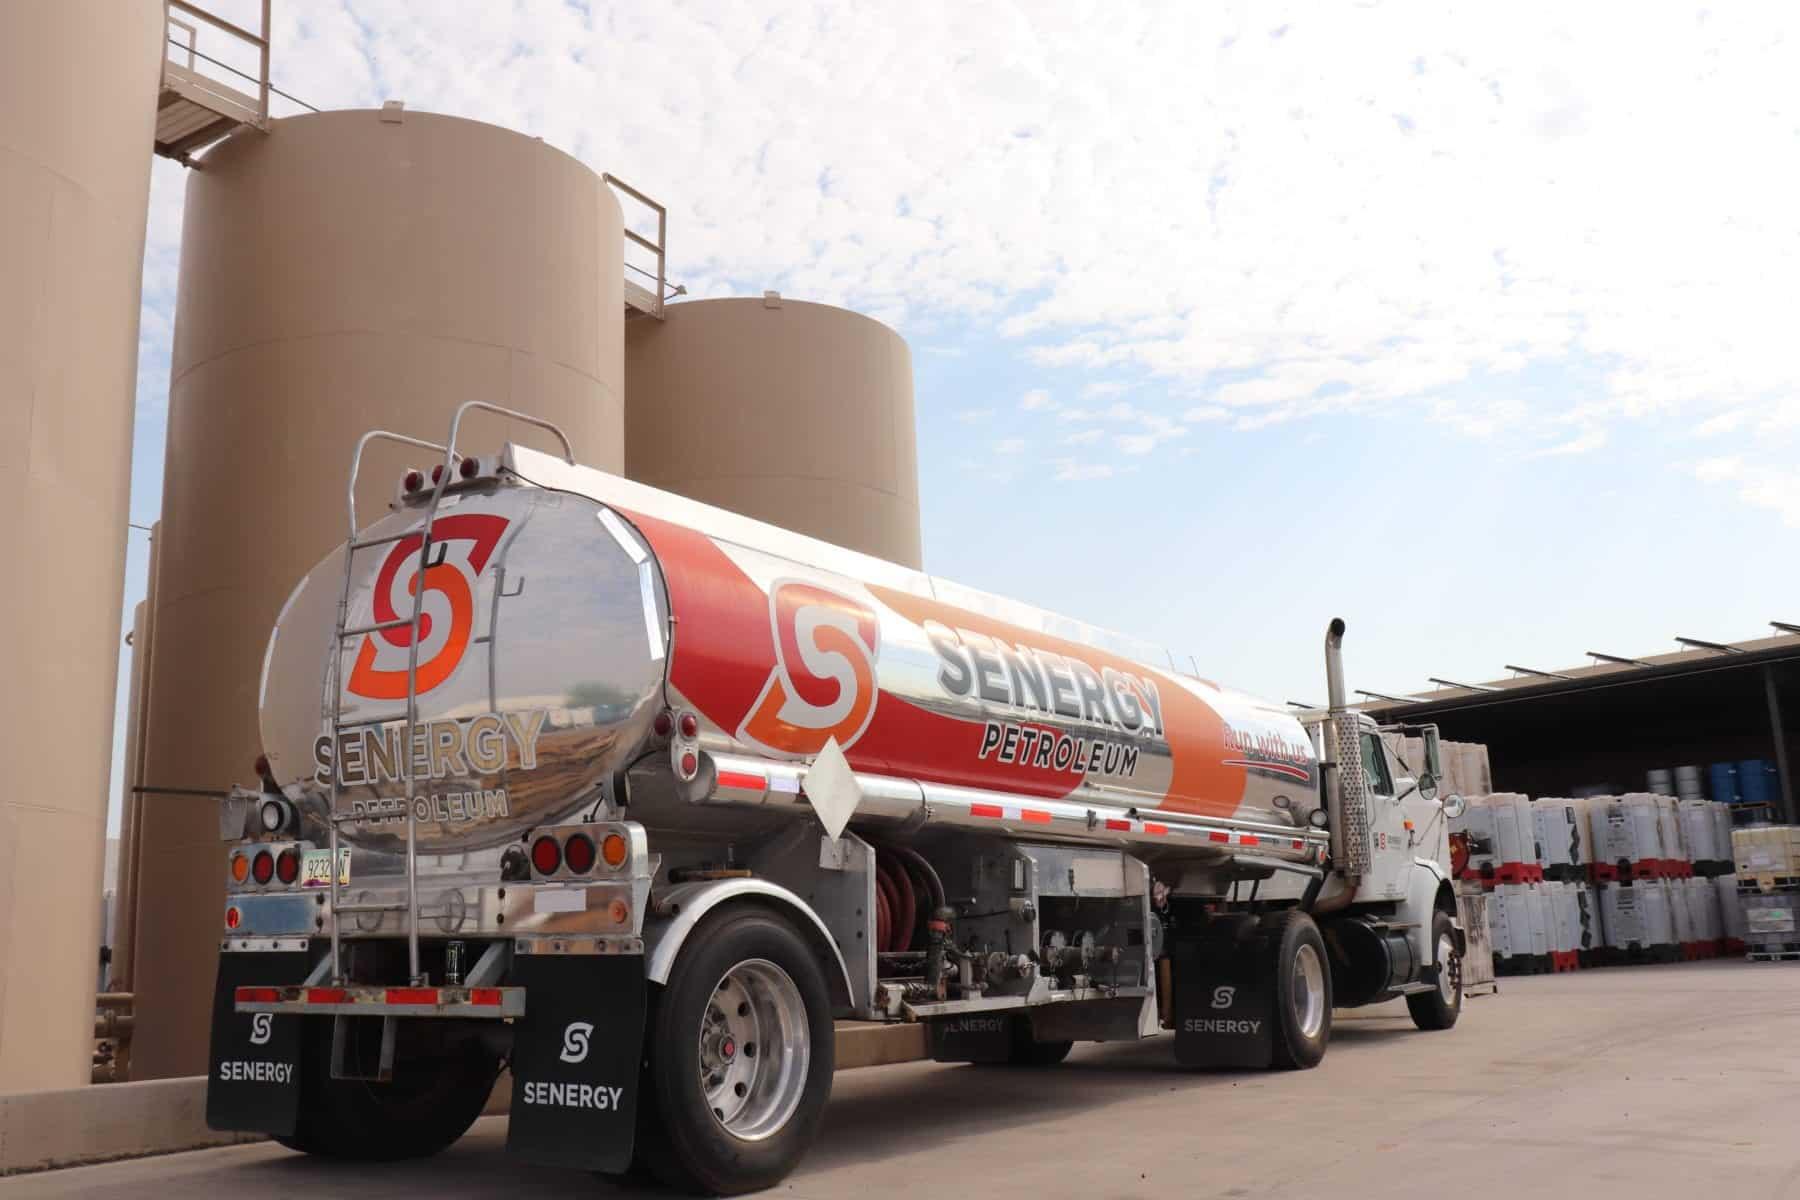 Senergy Petroleum - PetroStop Cardlock logo